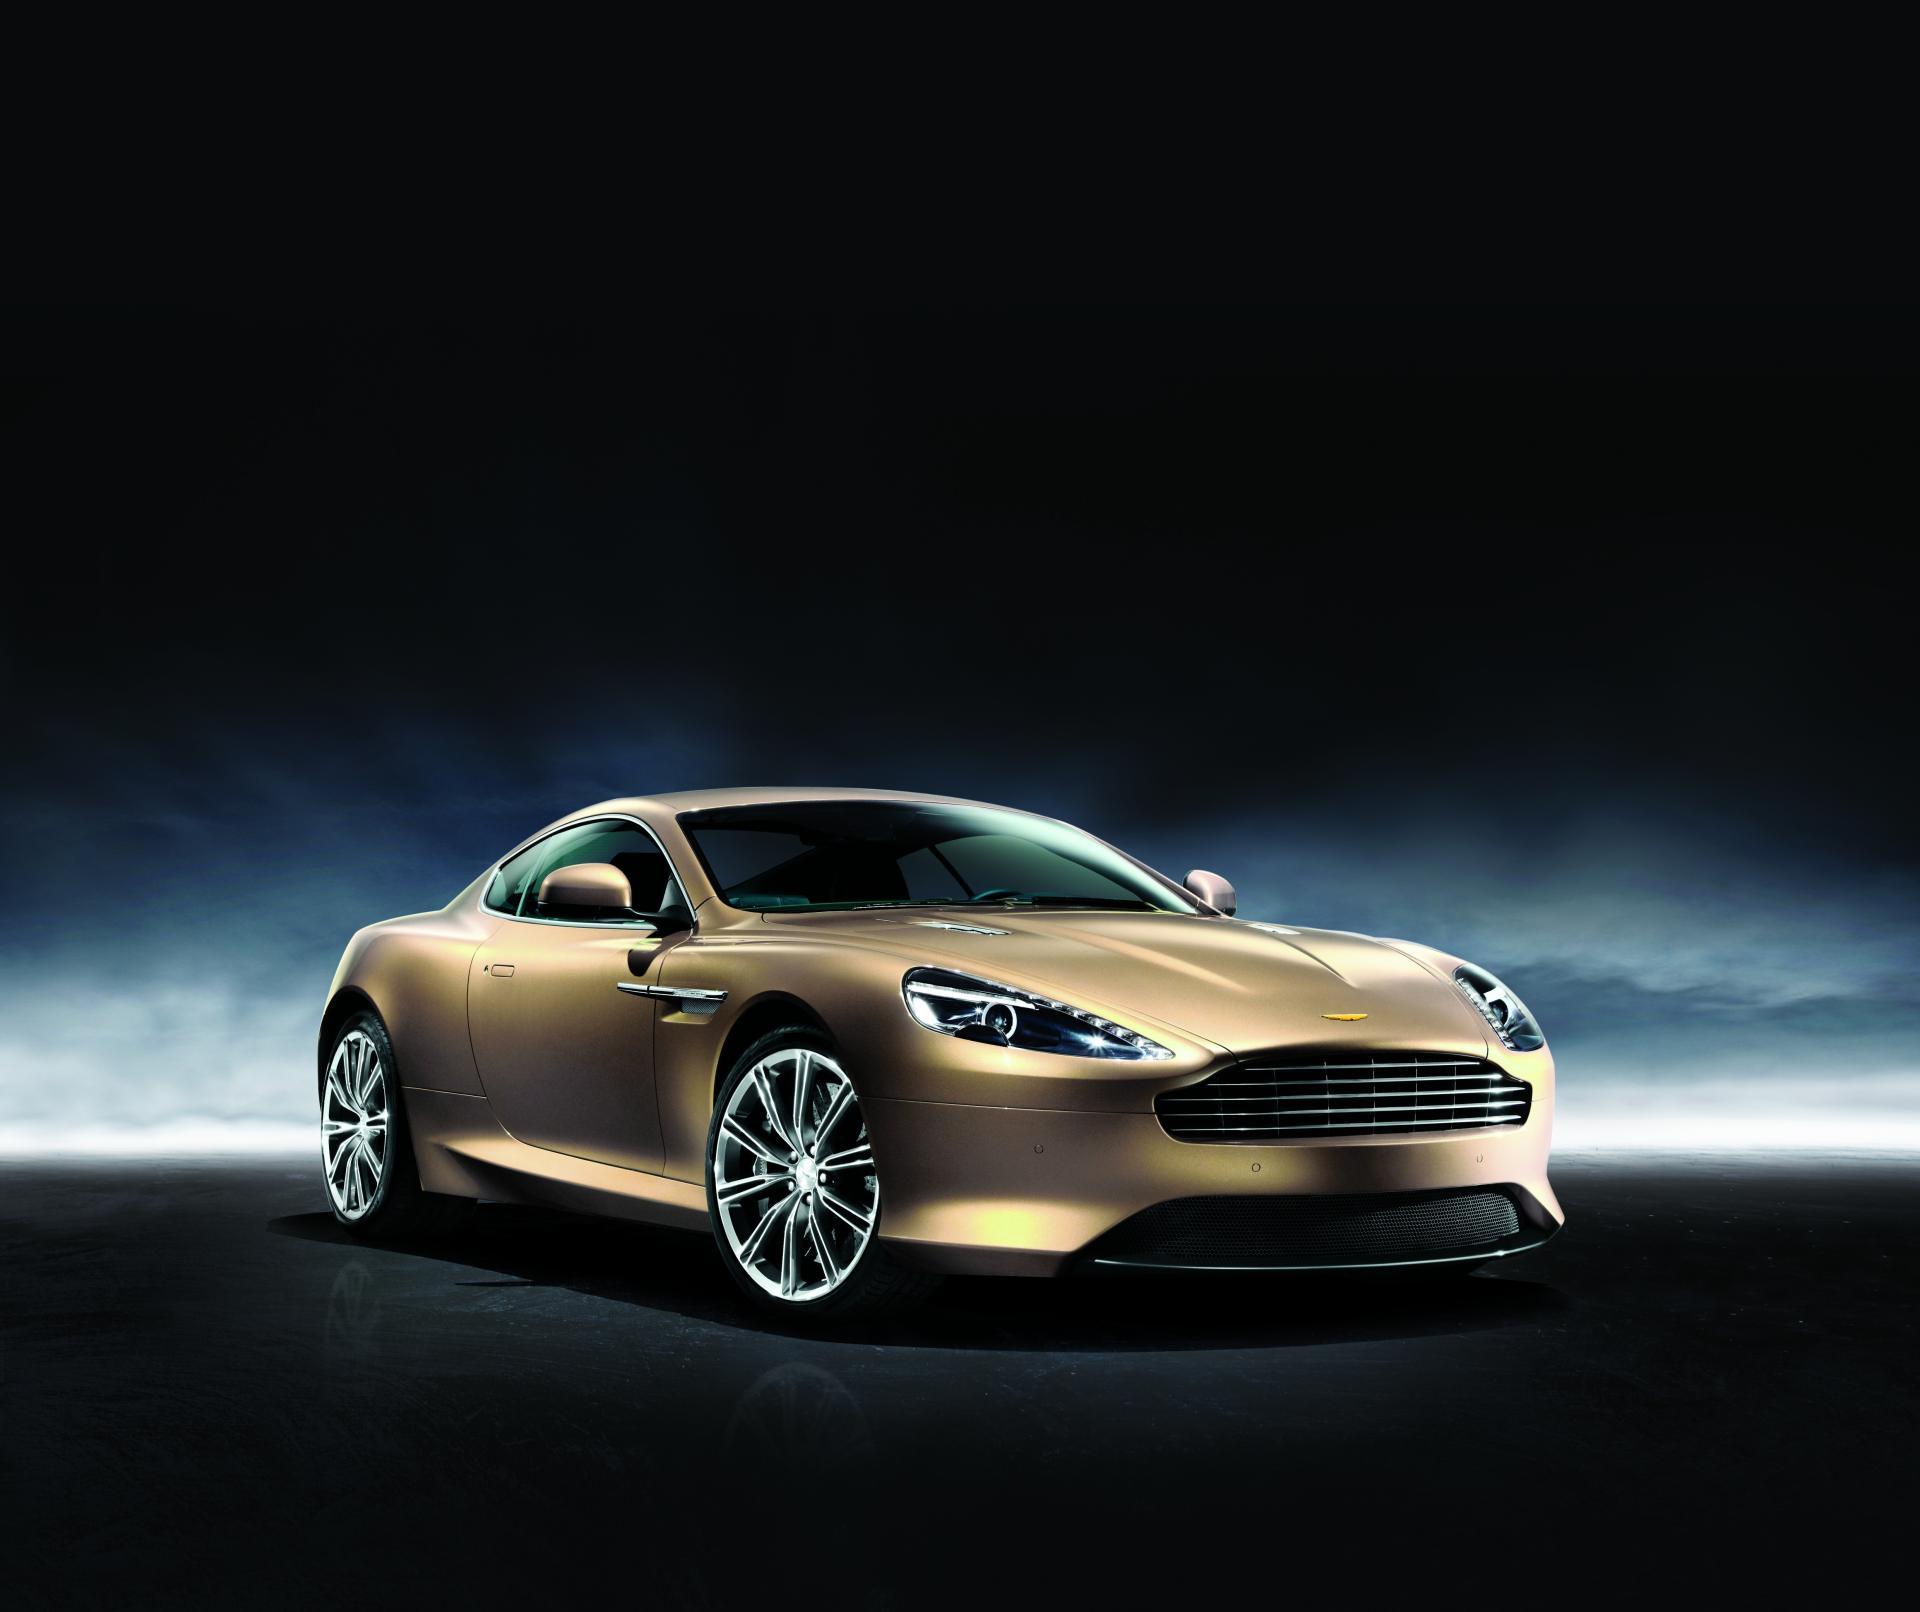 2012 Aston Martin Virage Dragon 88 News And Information